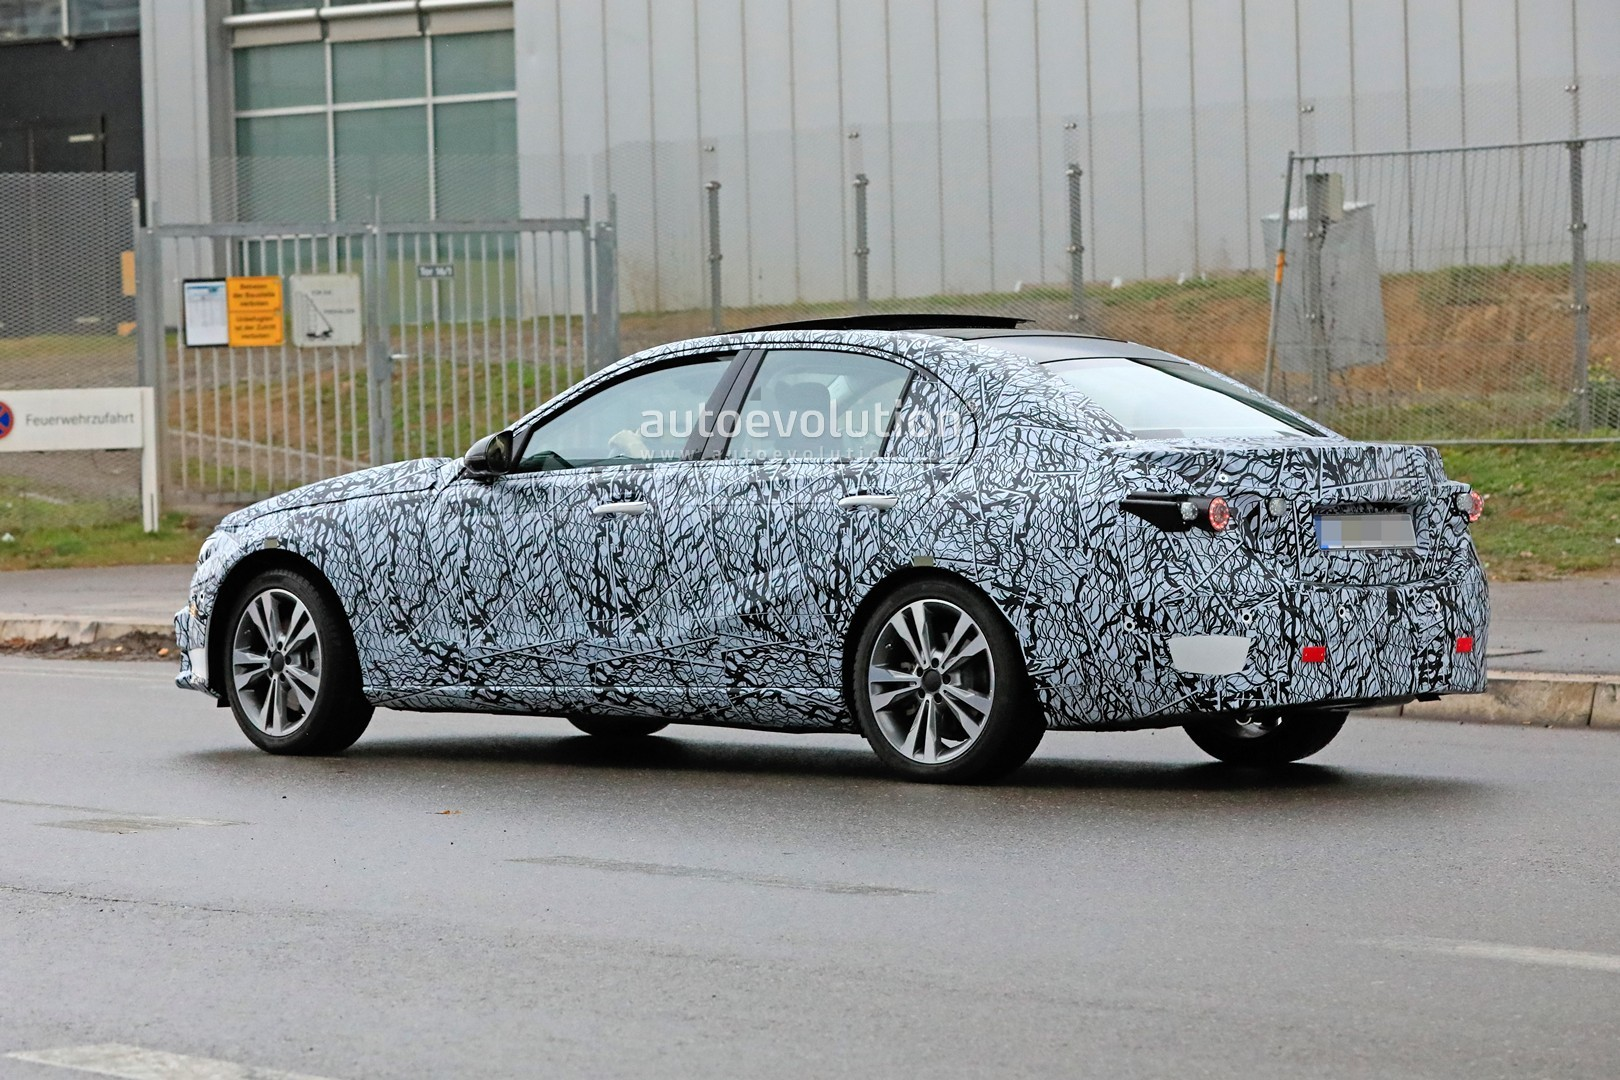 2021 mercedesbenz cclass sedan w206 makes spyshots